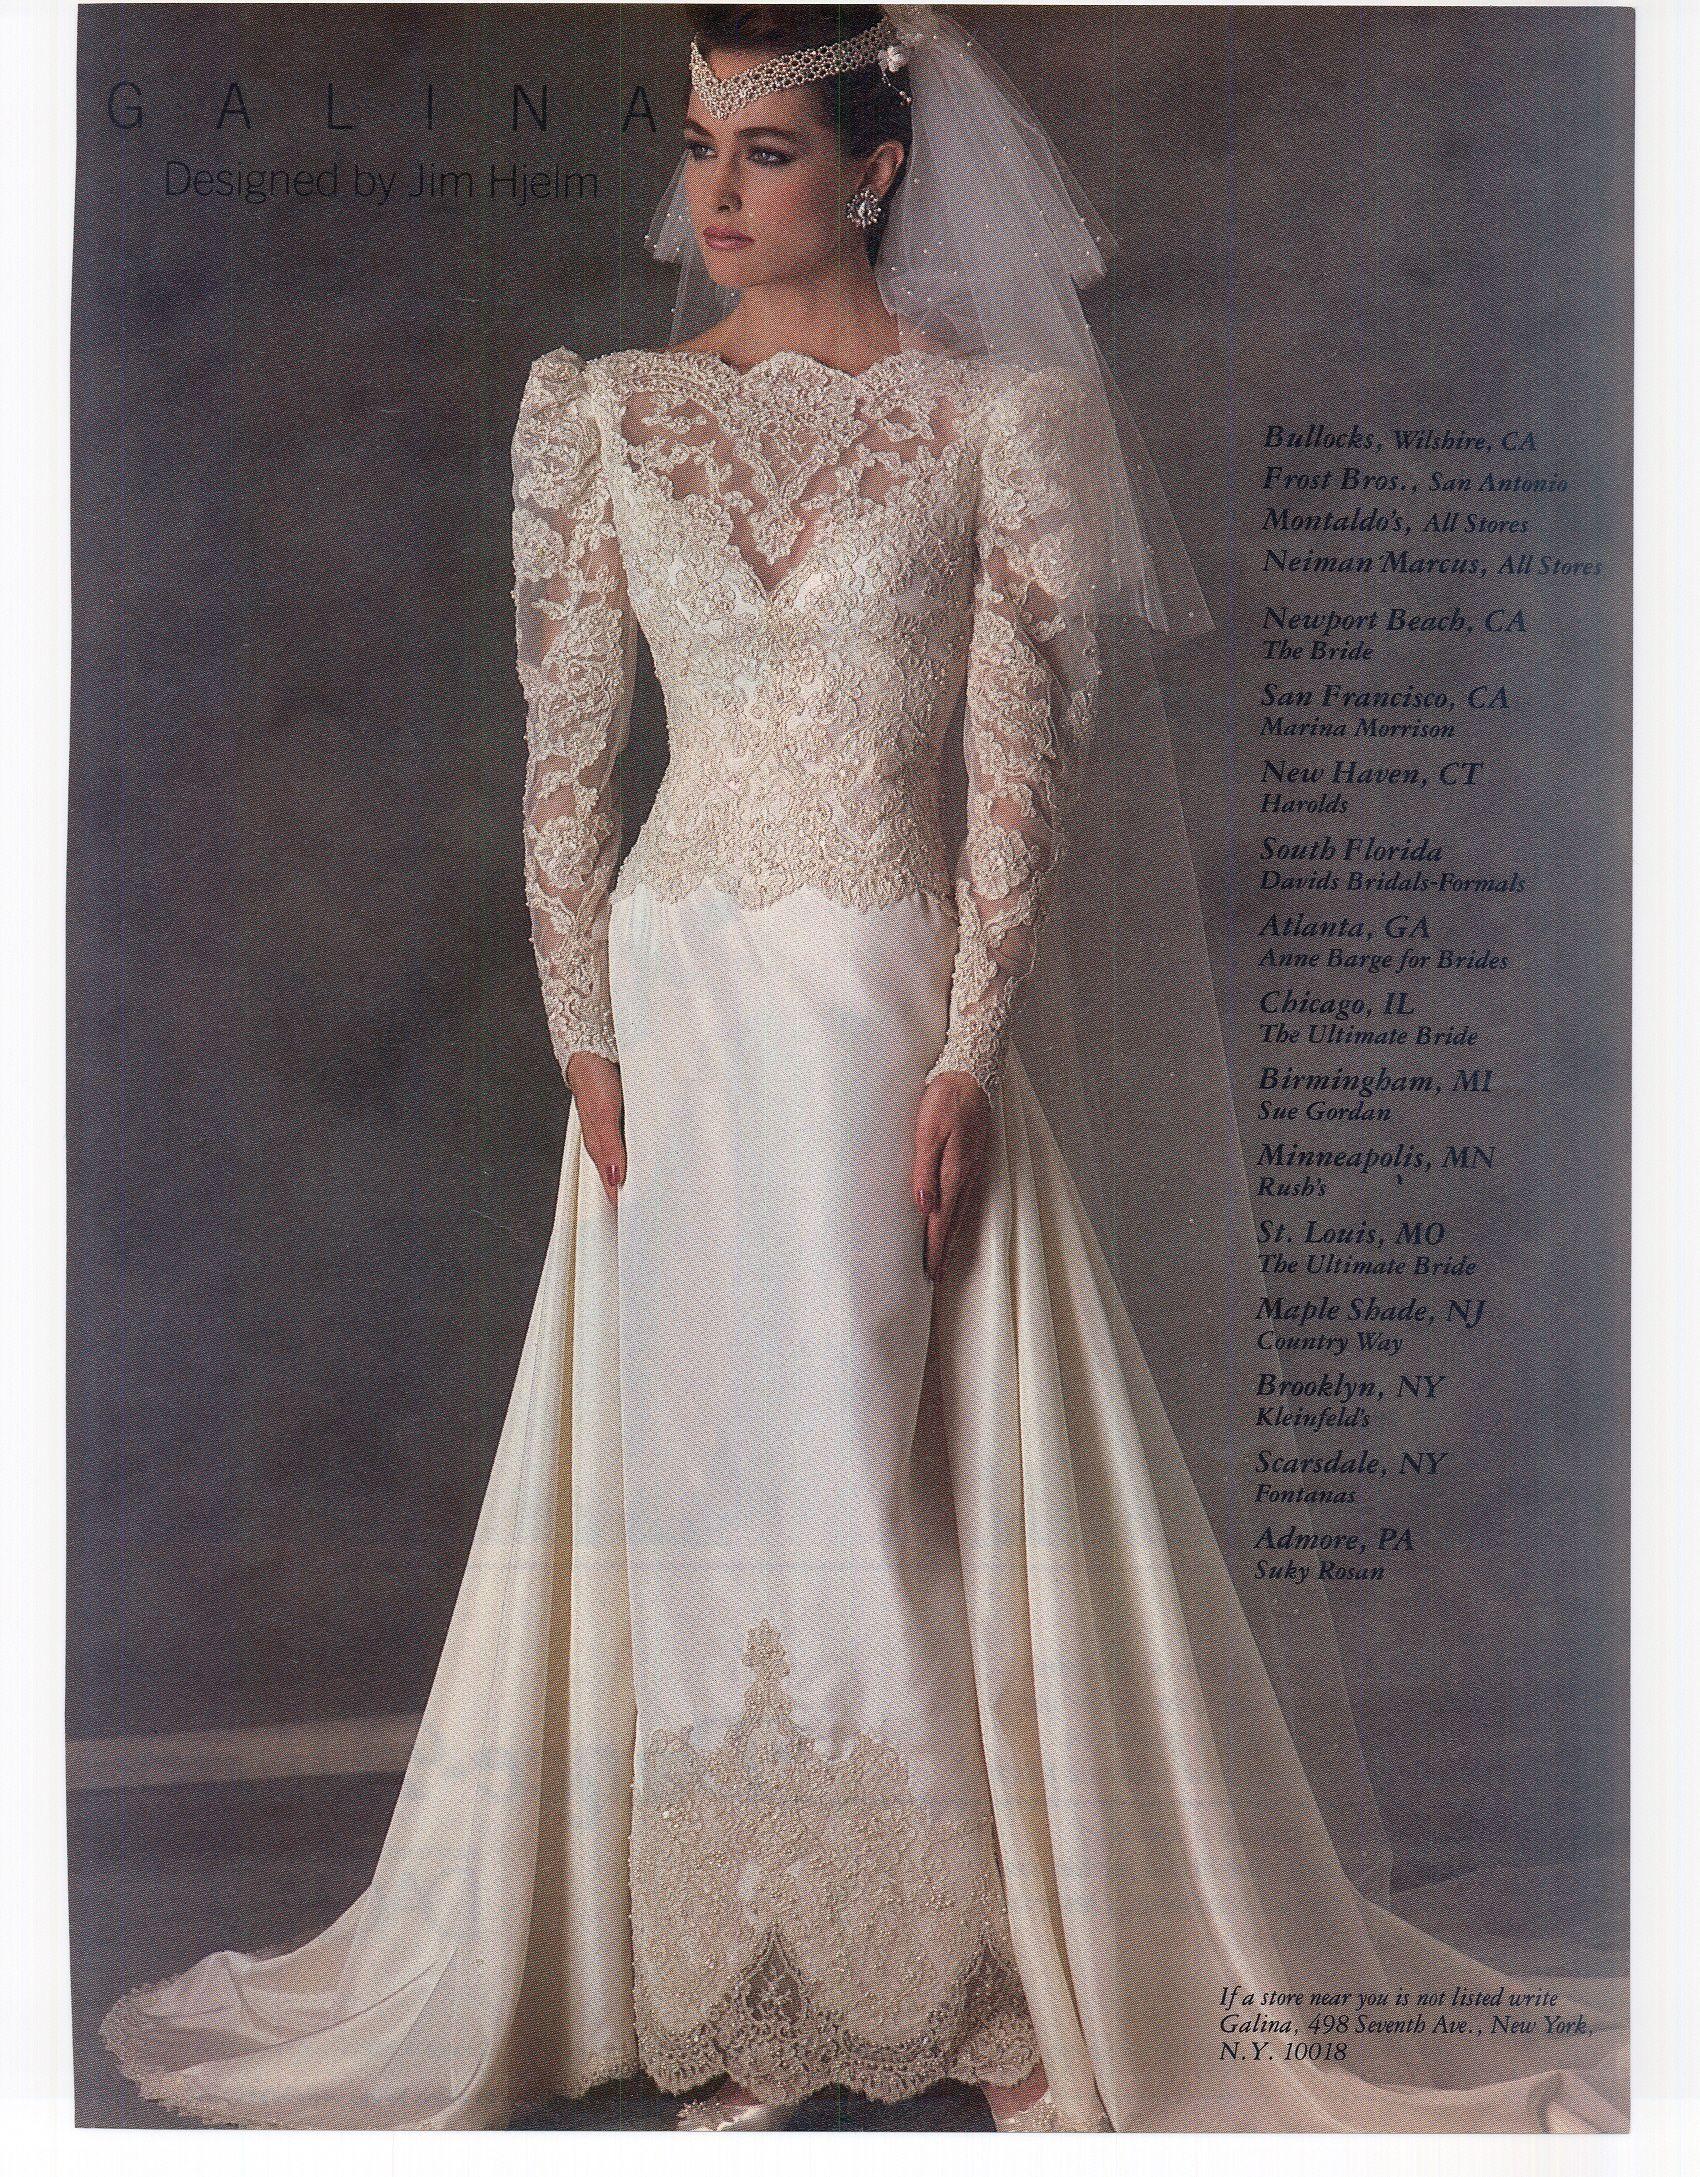 Modern bride april may 1986 vintage weddings pinterest for Bridesmaid dresses for april wedding